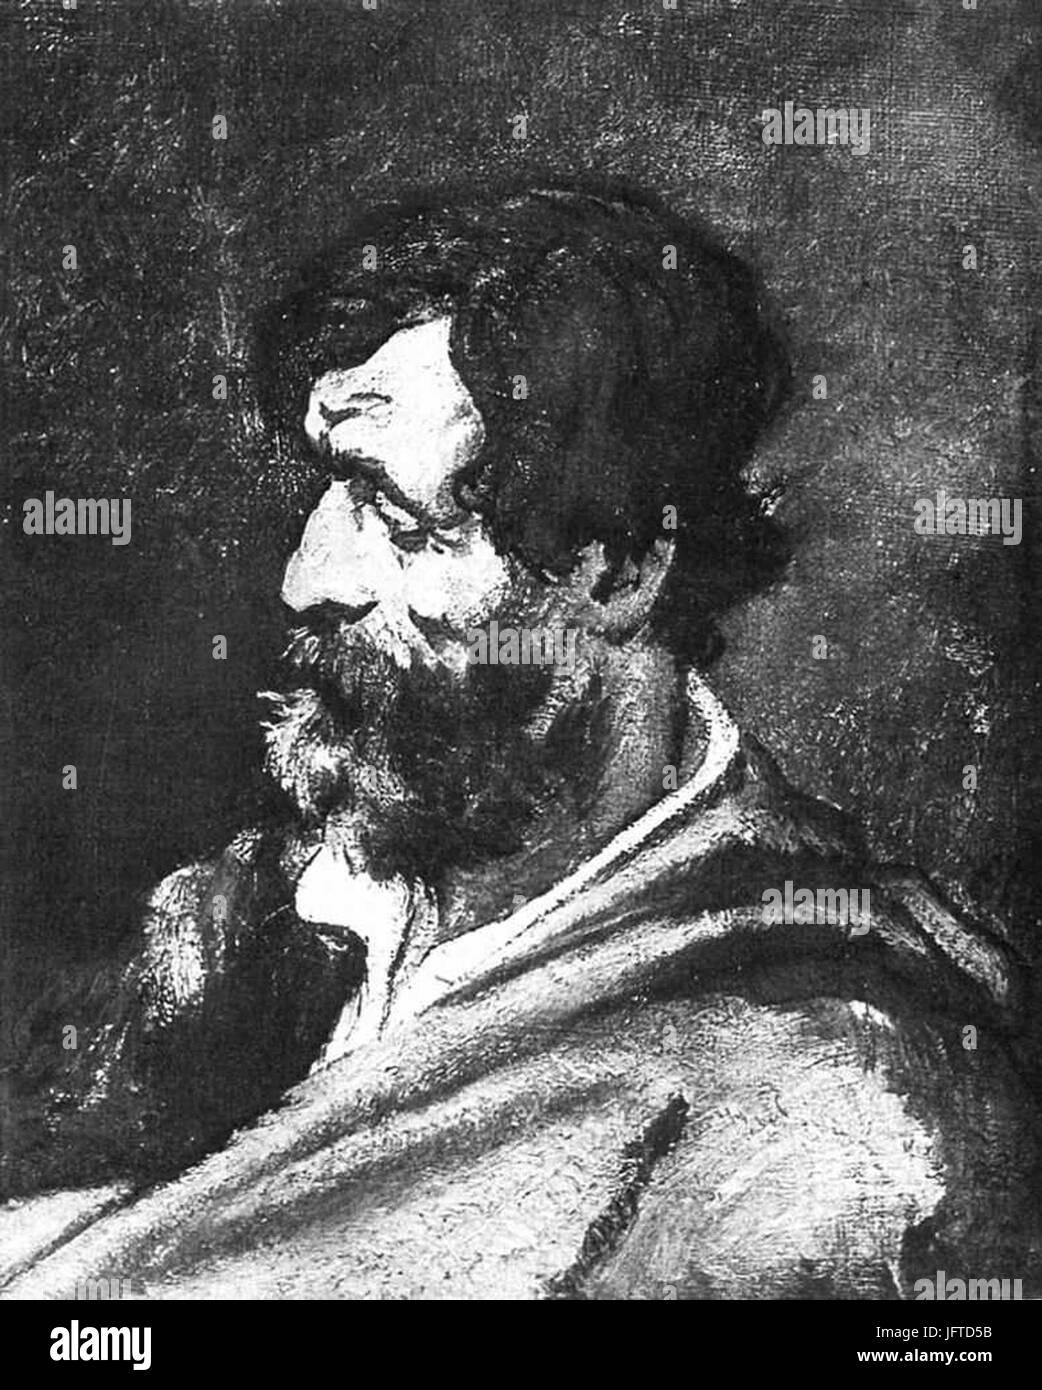 Édouard Manet - TơAAte d homme (RW 11) - Stock Image